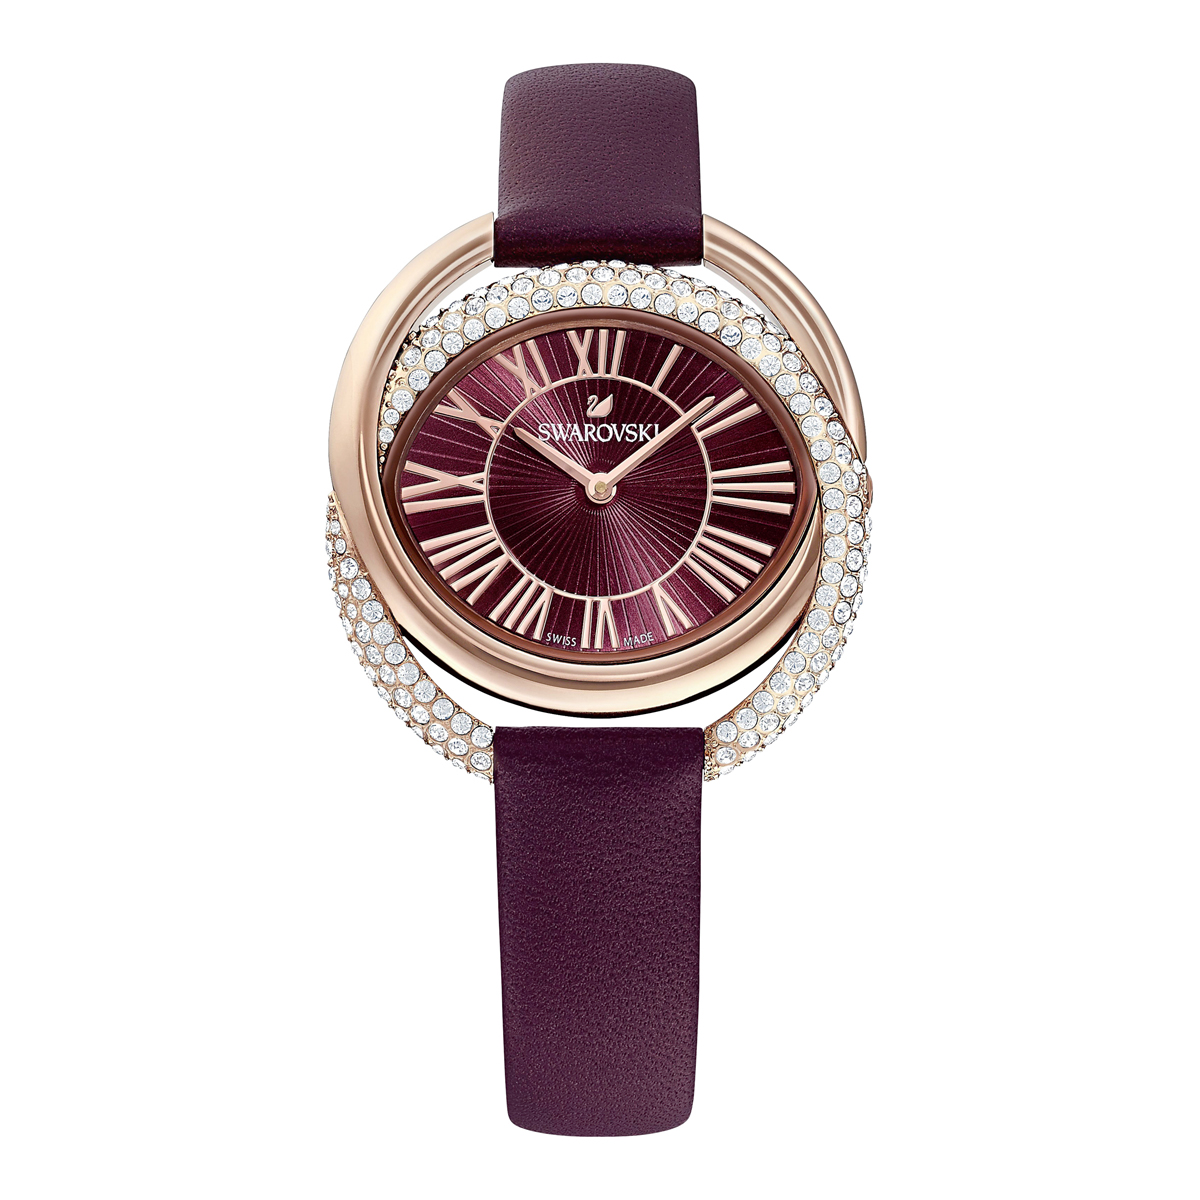 Swarovski Duo Watch, Leather Strap, Dark red, Rose Gold